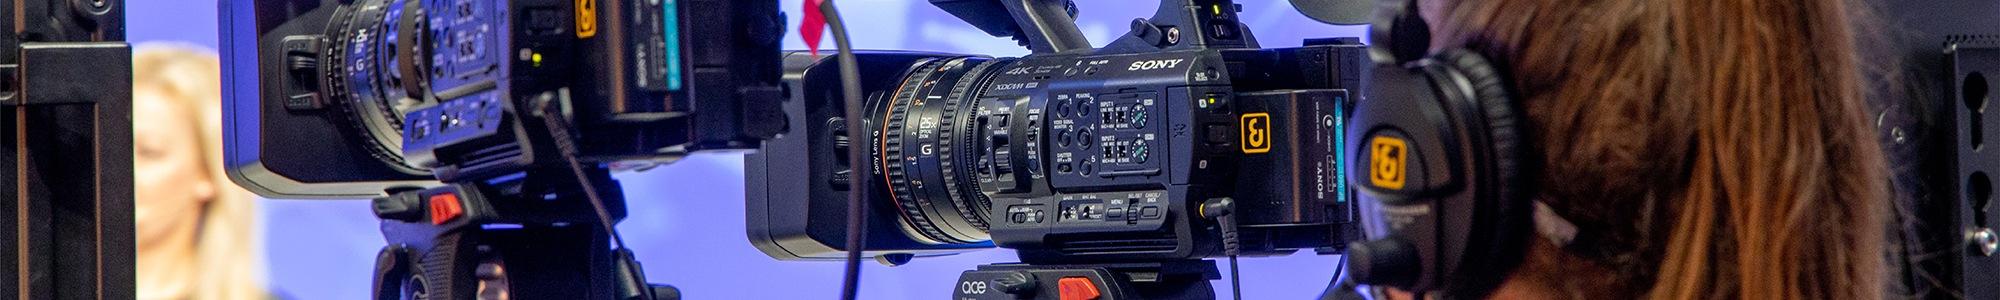 Live Streaming Product Launch von Atlantik Network